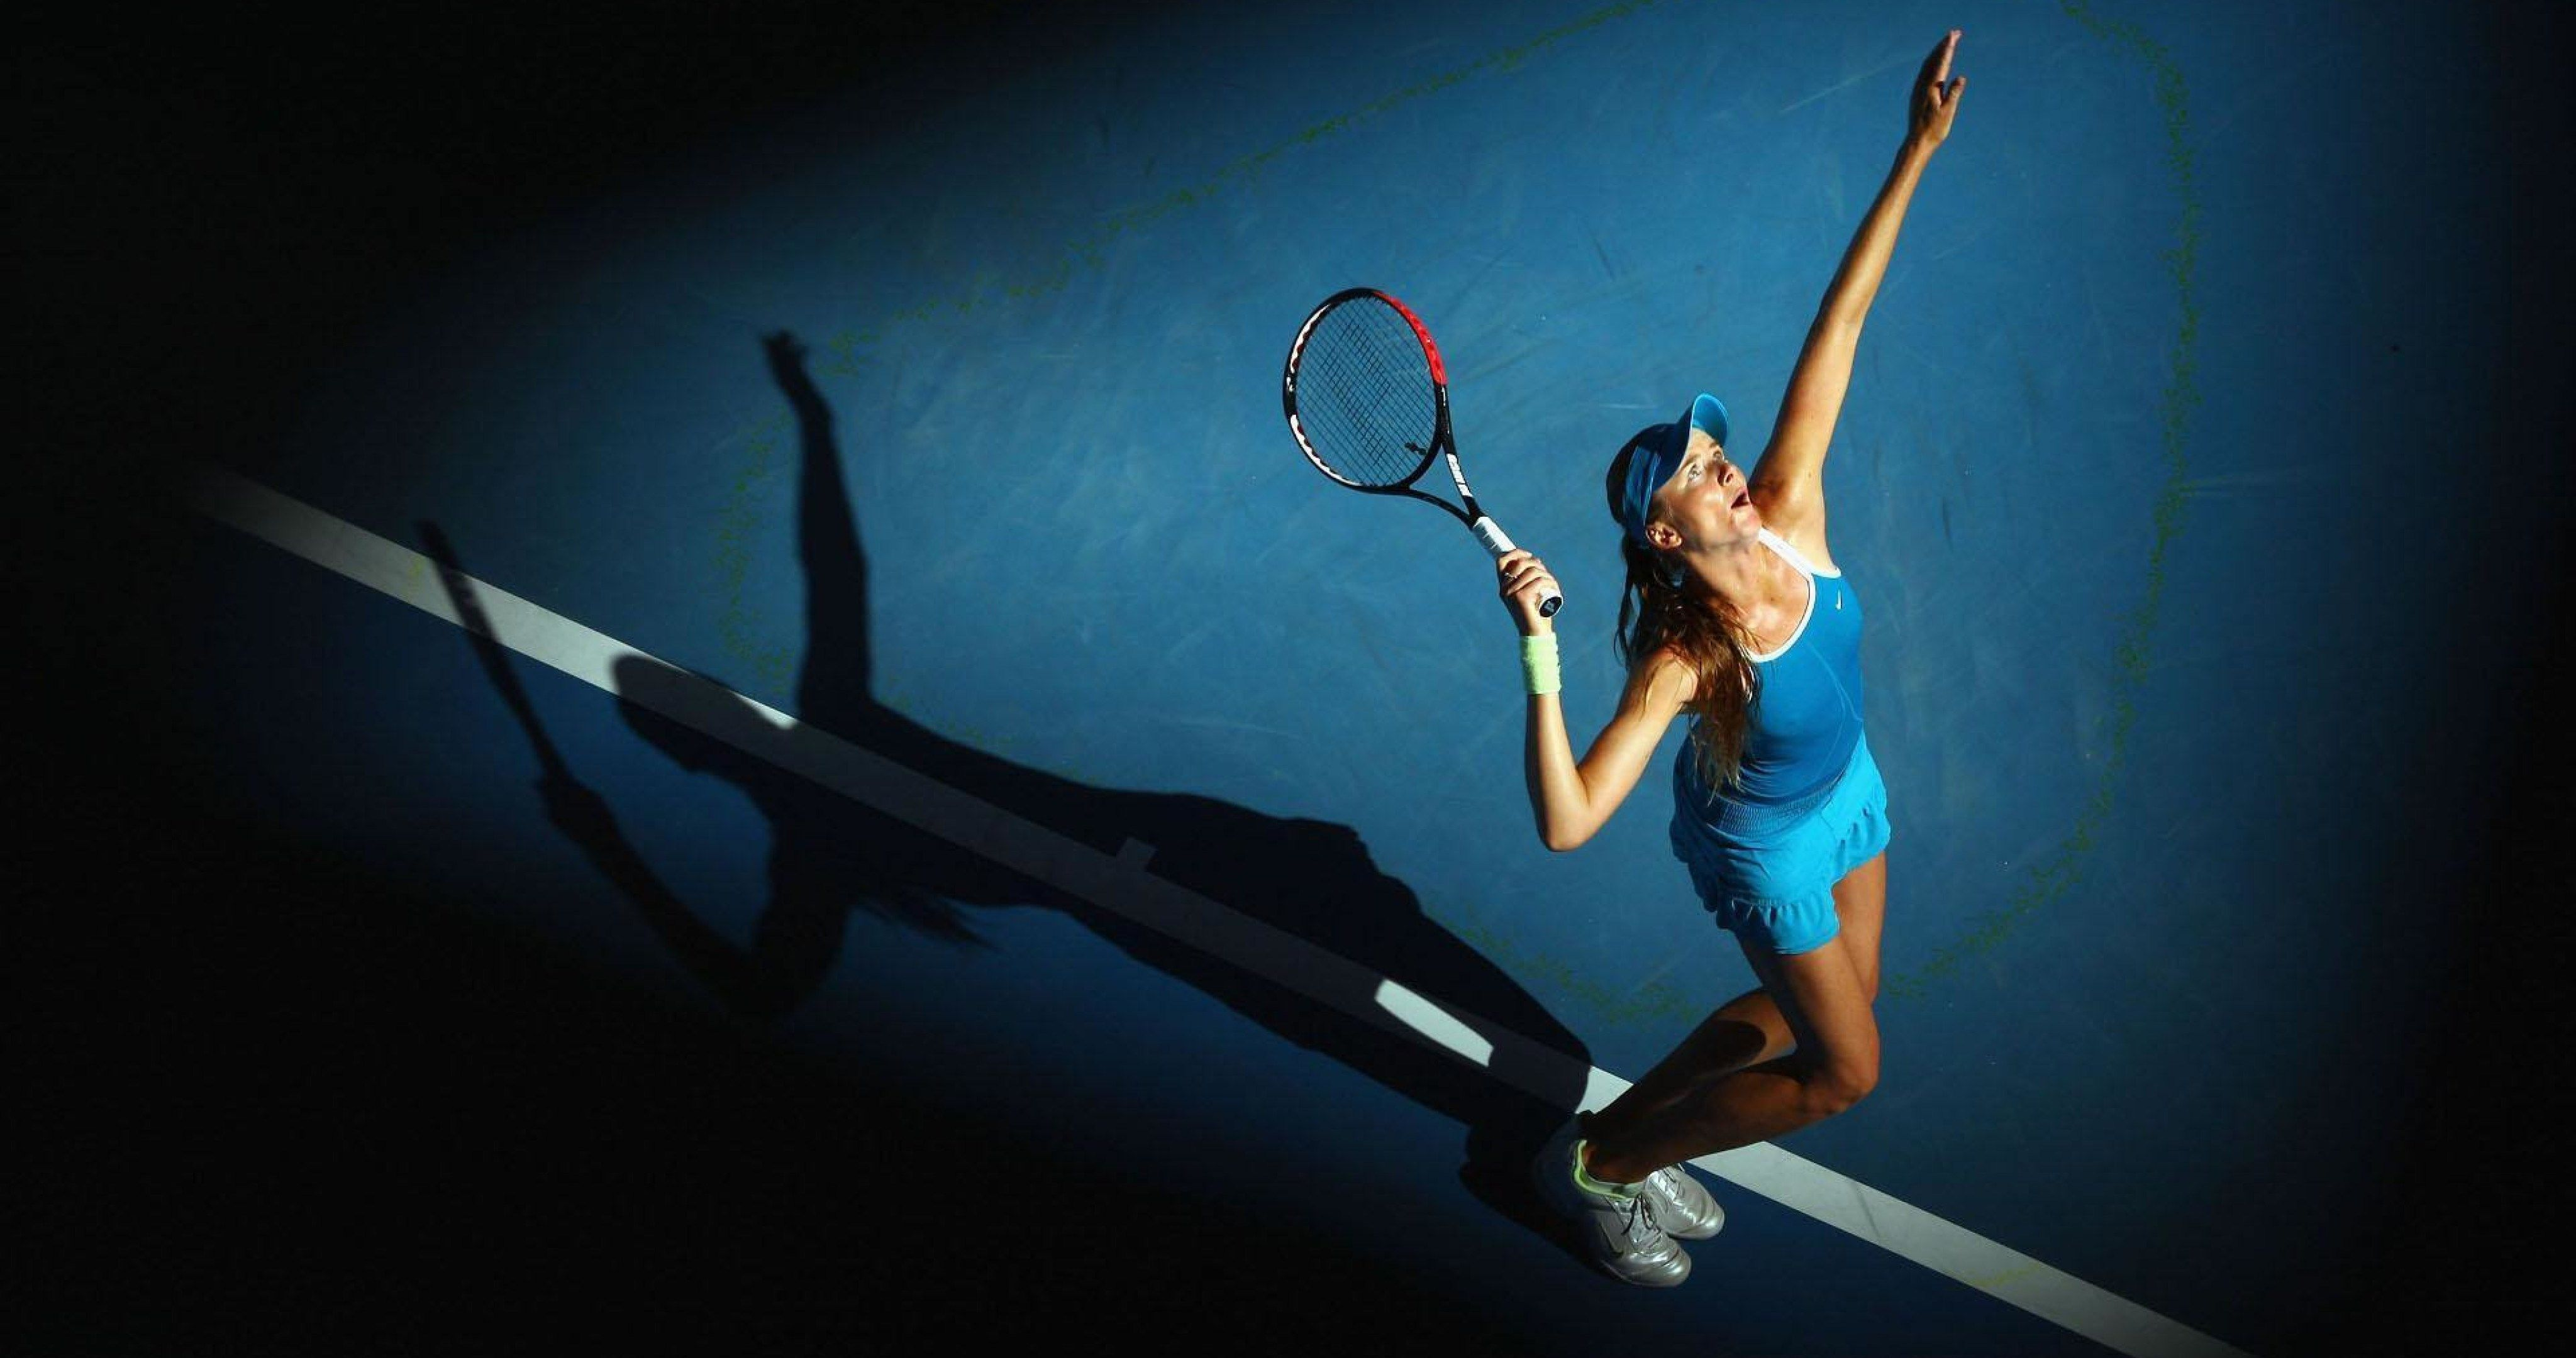 Woman Tennis Player 1080p Hd Wallpaper Sports: Daniela Hantuchova Tennis 4k Ultra Hd Wallpaper